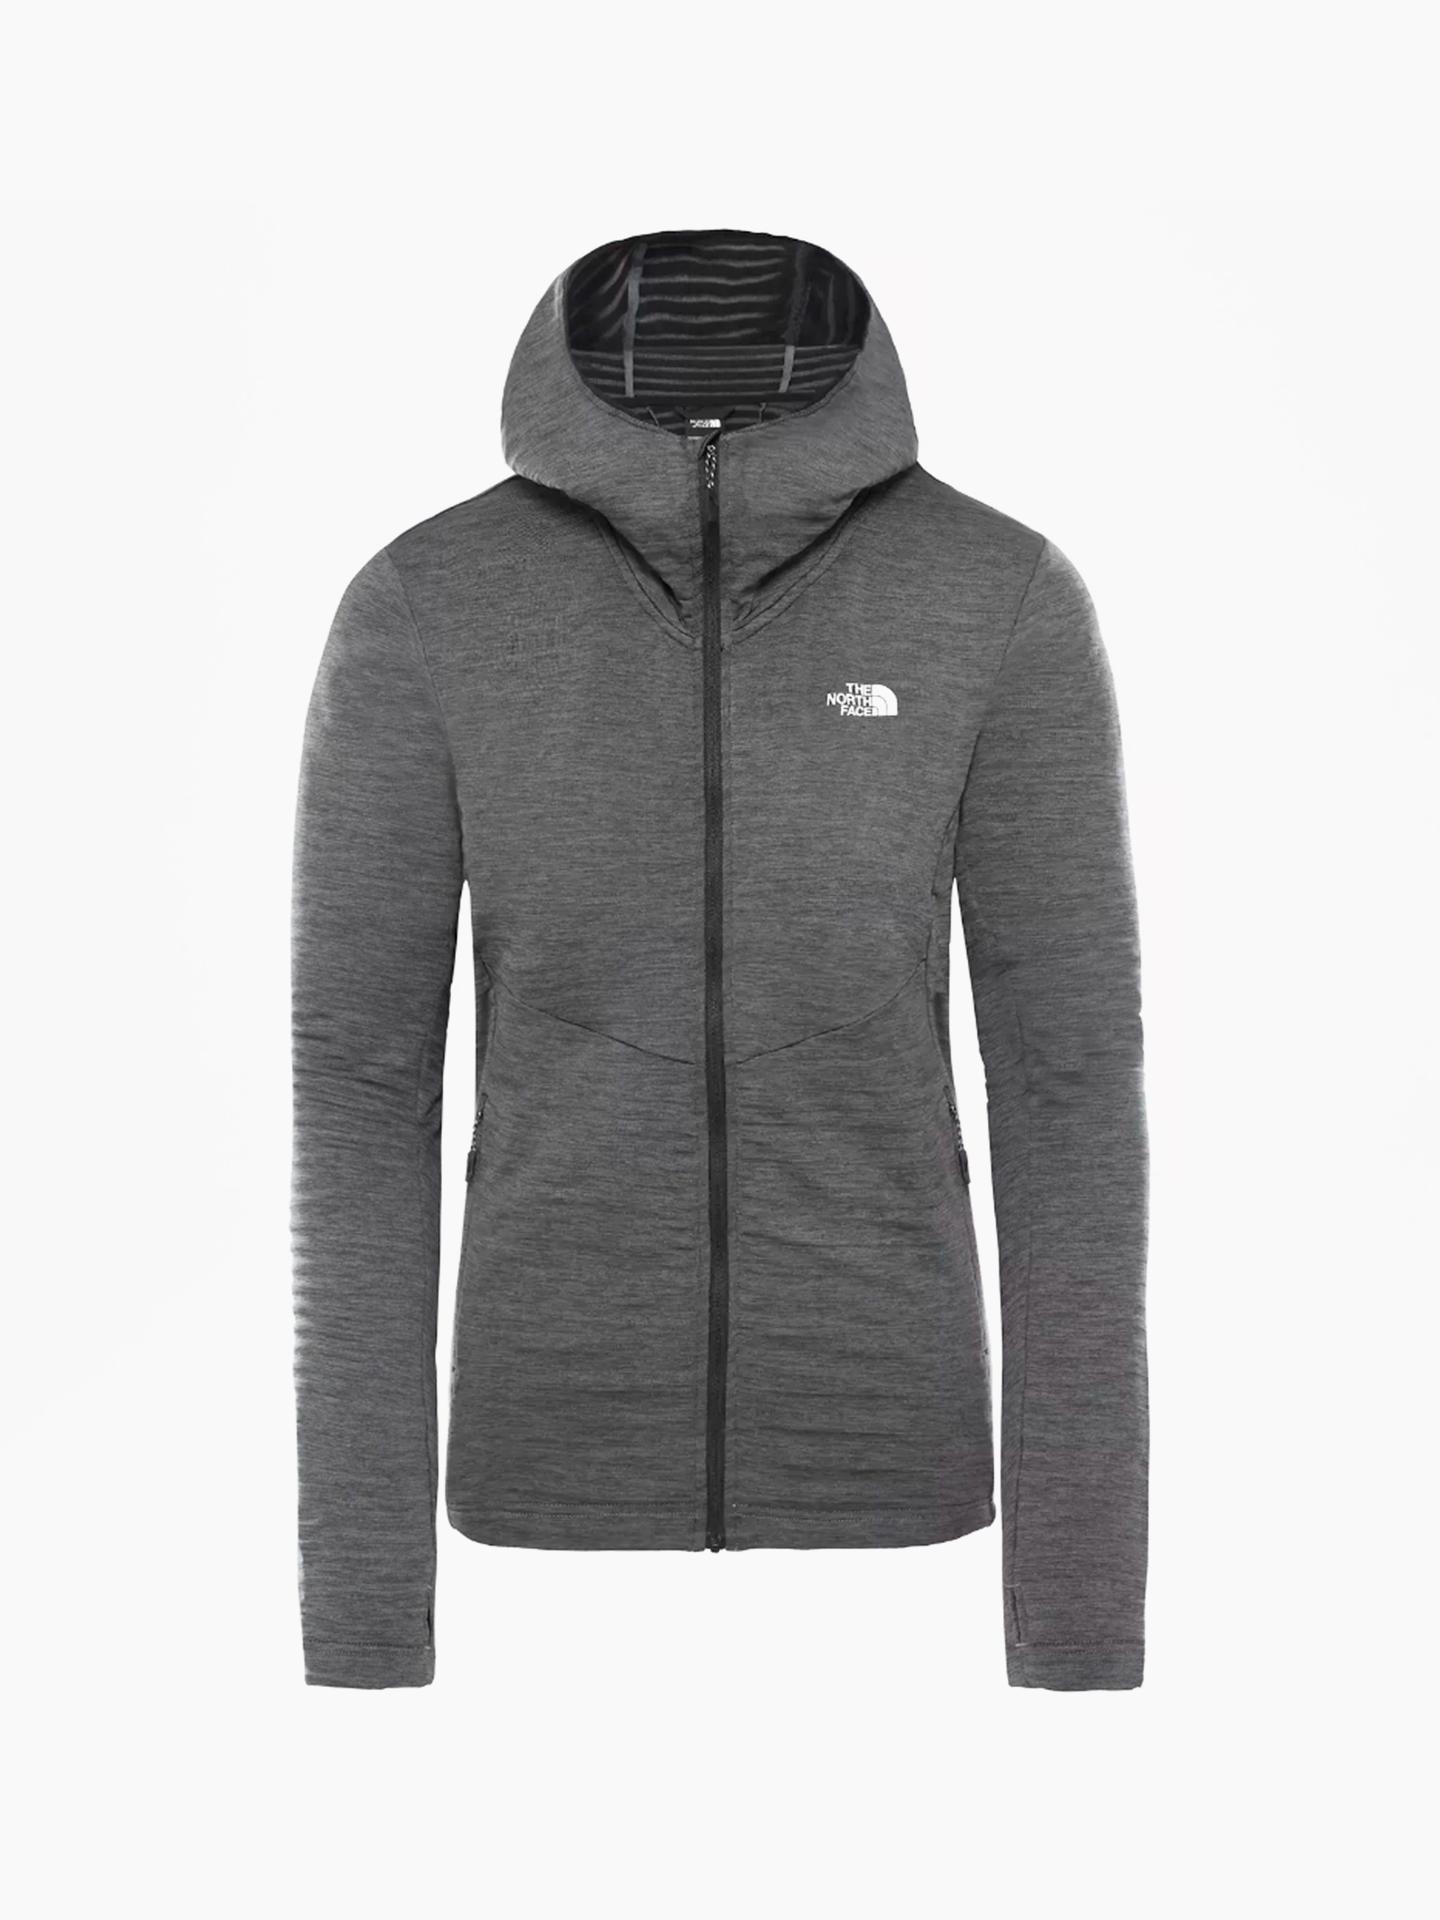 Женская куртка The North Face Impendor Light Hooded Fleece